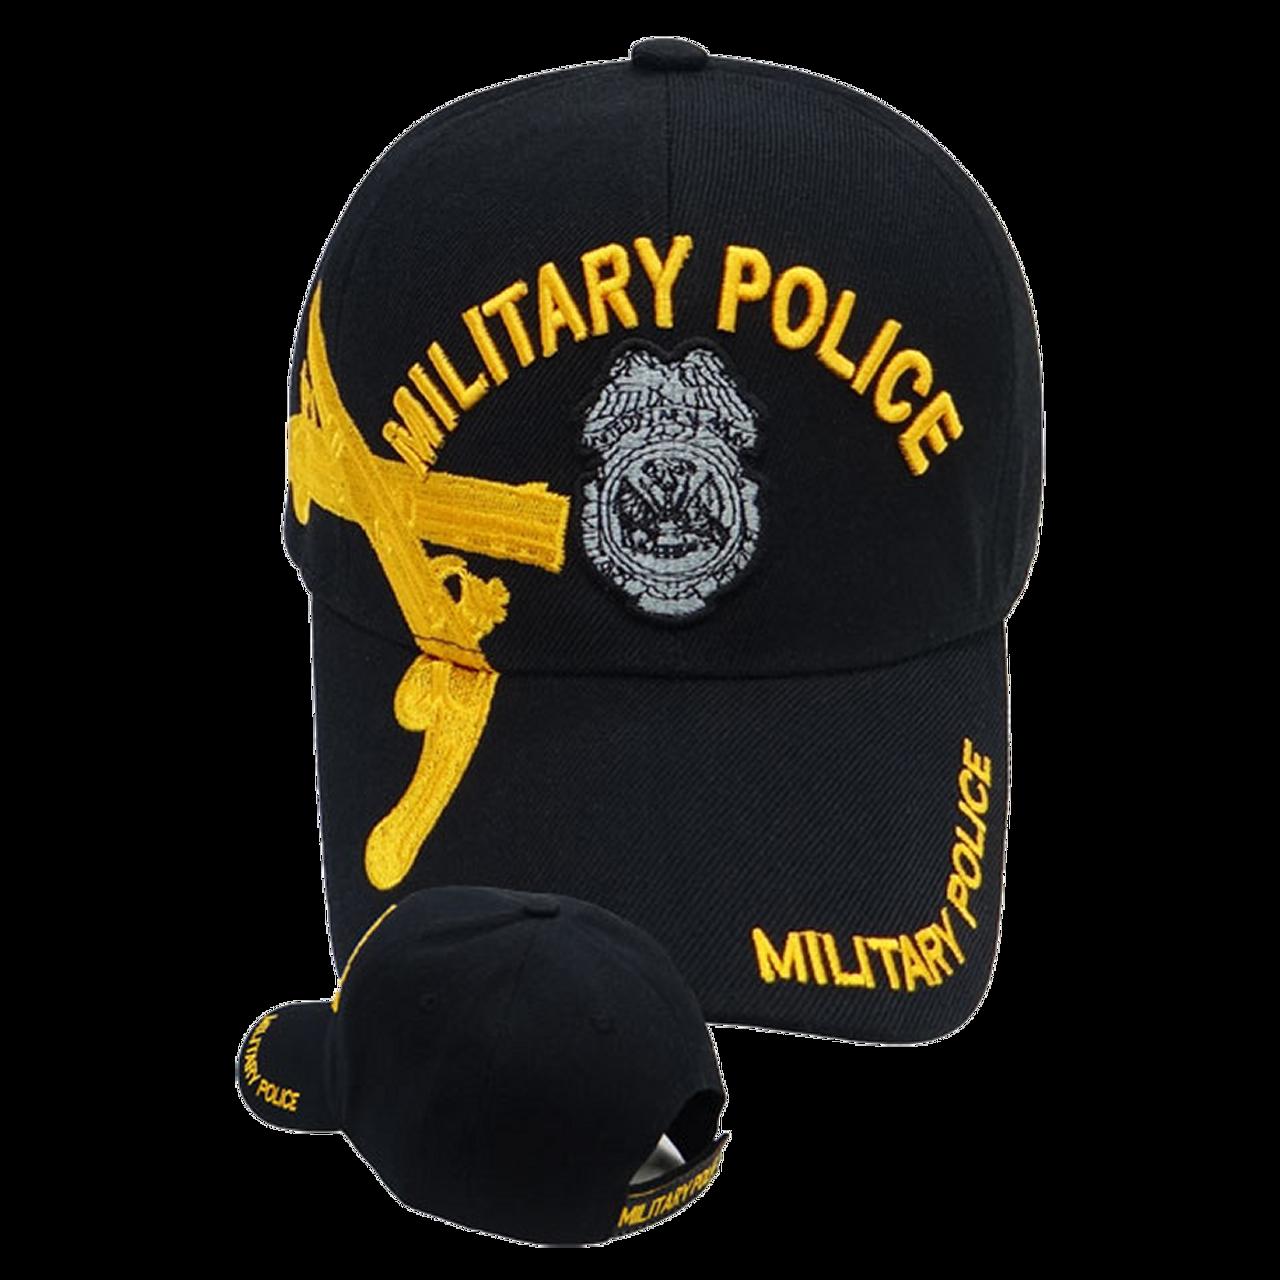 a7f4f661084de Military Police Caps - US Military Hats